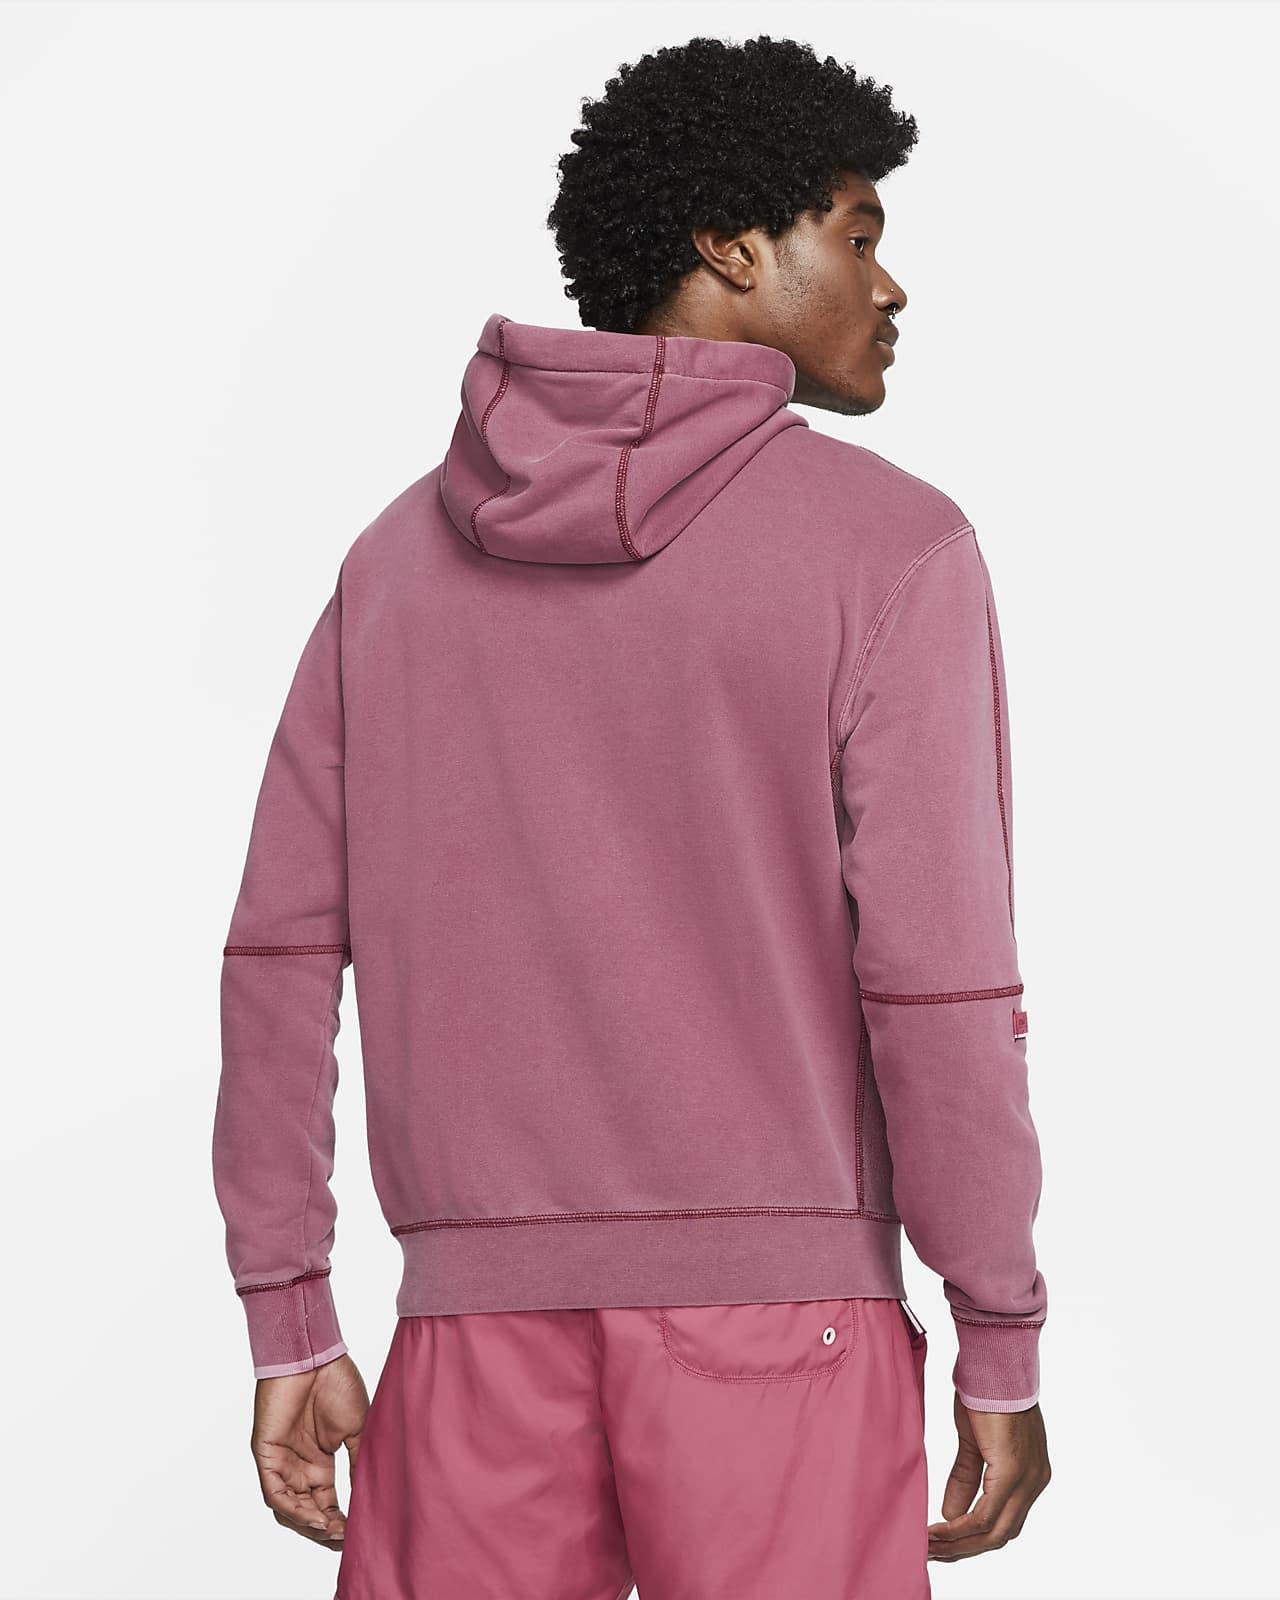 Predownload: Nike Sportswear Club Men S French Terry Pullover Hoodie Nike Com [ 1600 x 1280 Pixel ]